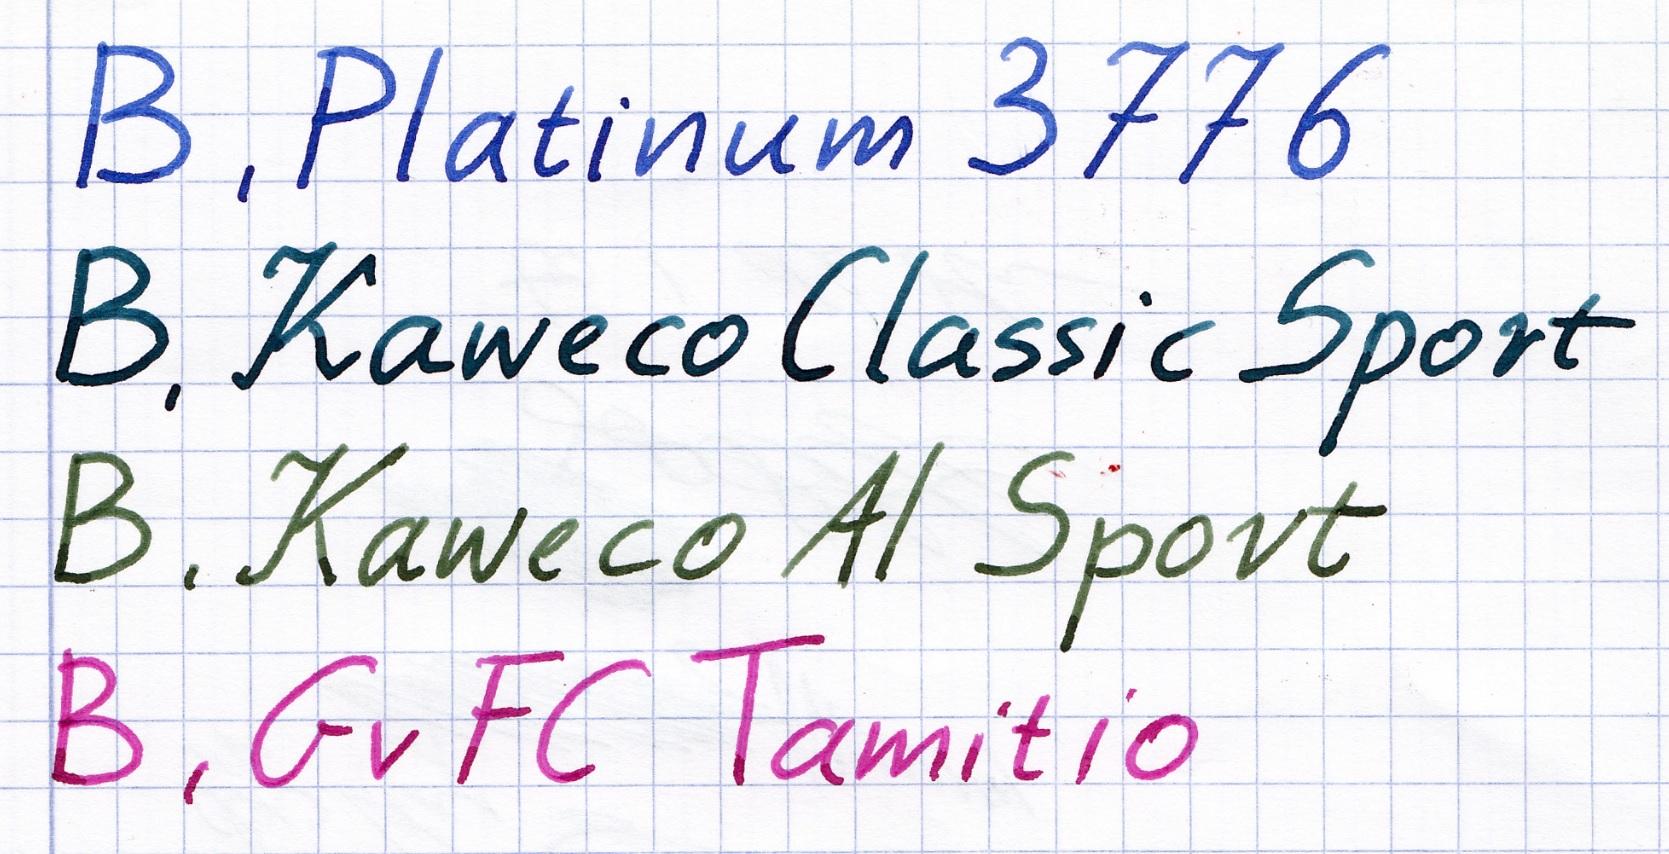 fpn_1457274174__tamitio_b.jpg